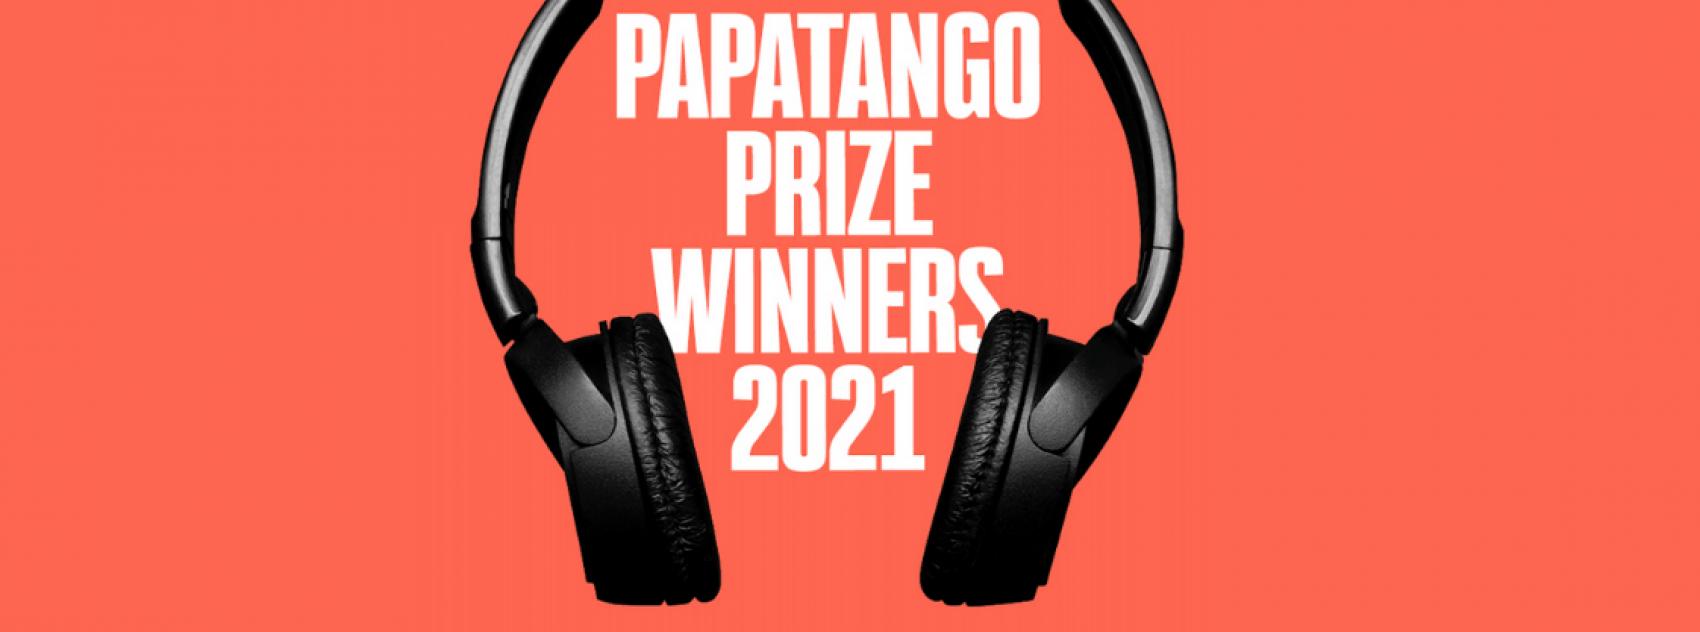 Papatango 1122x630 2